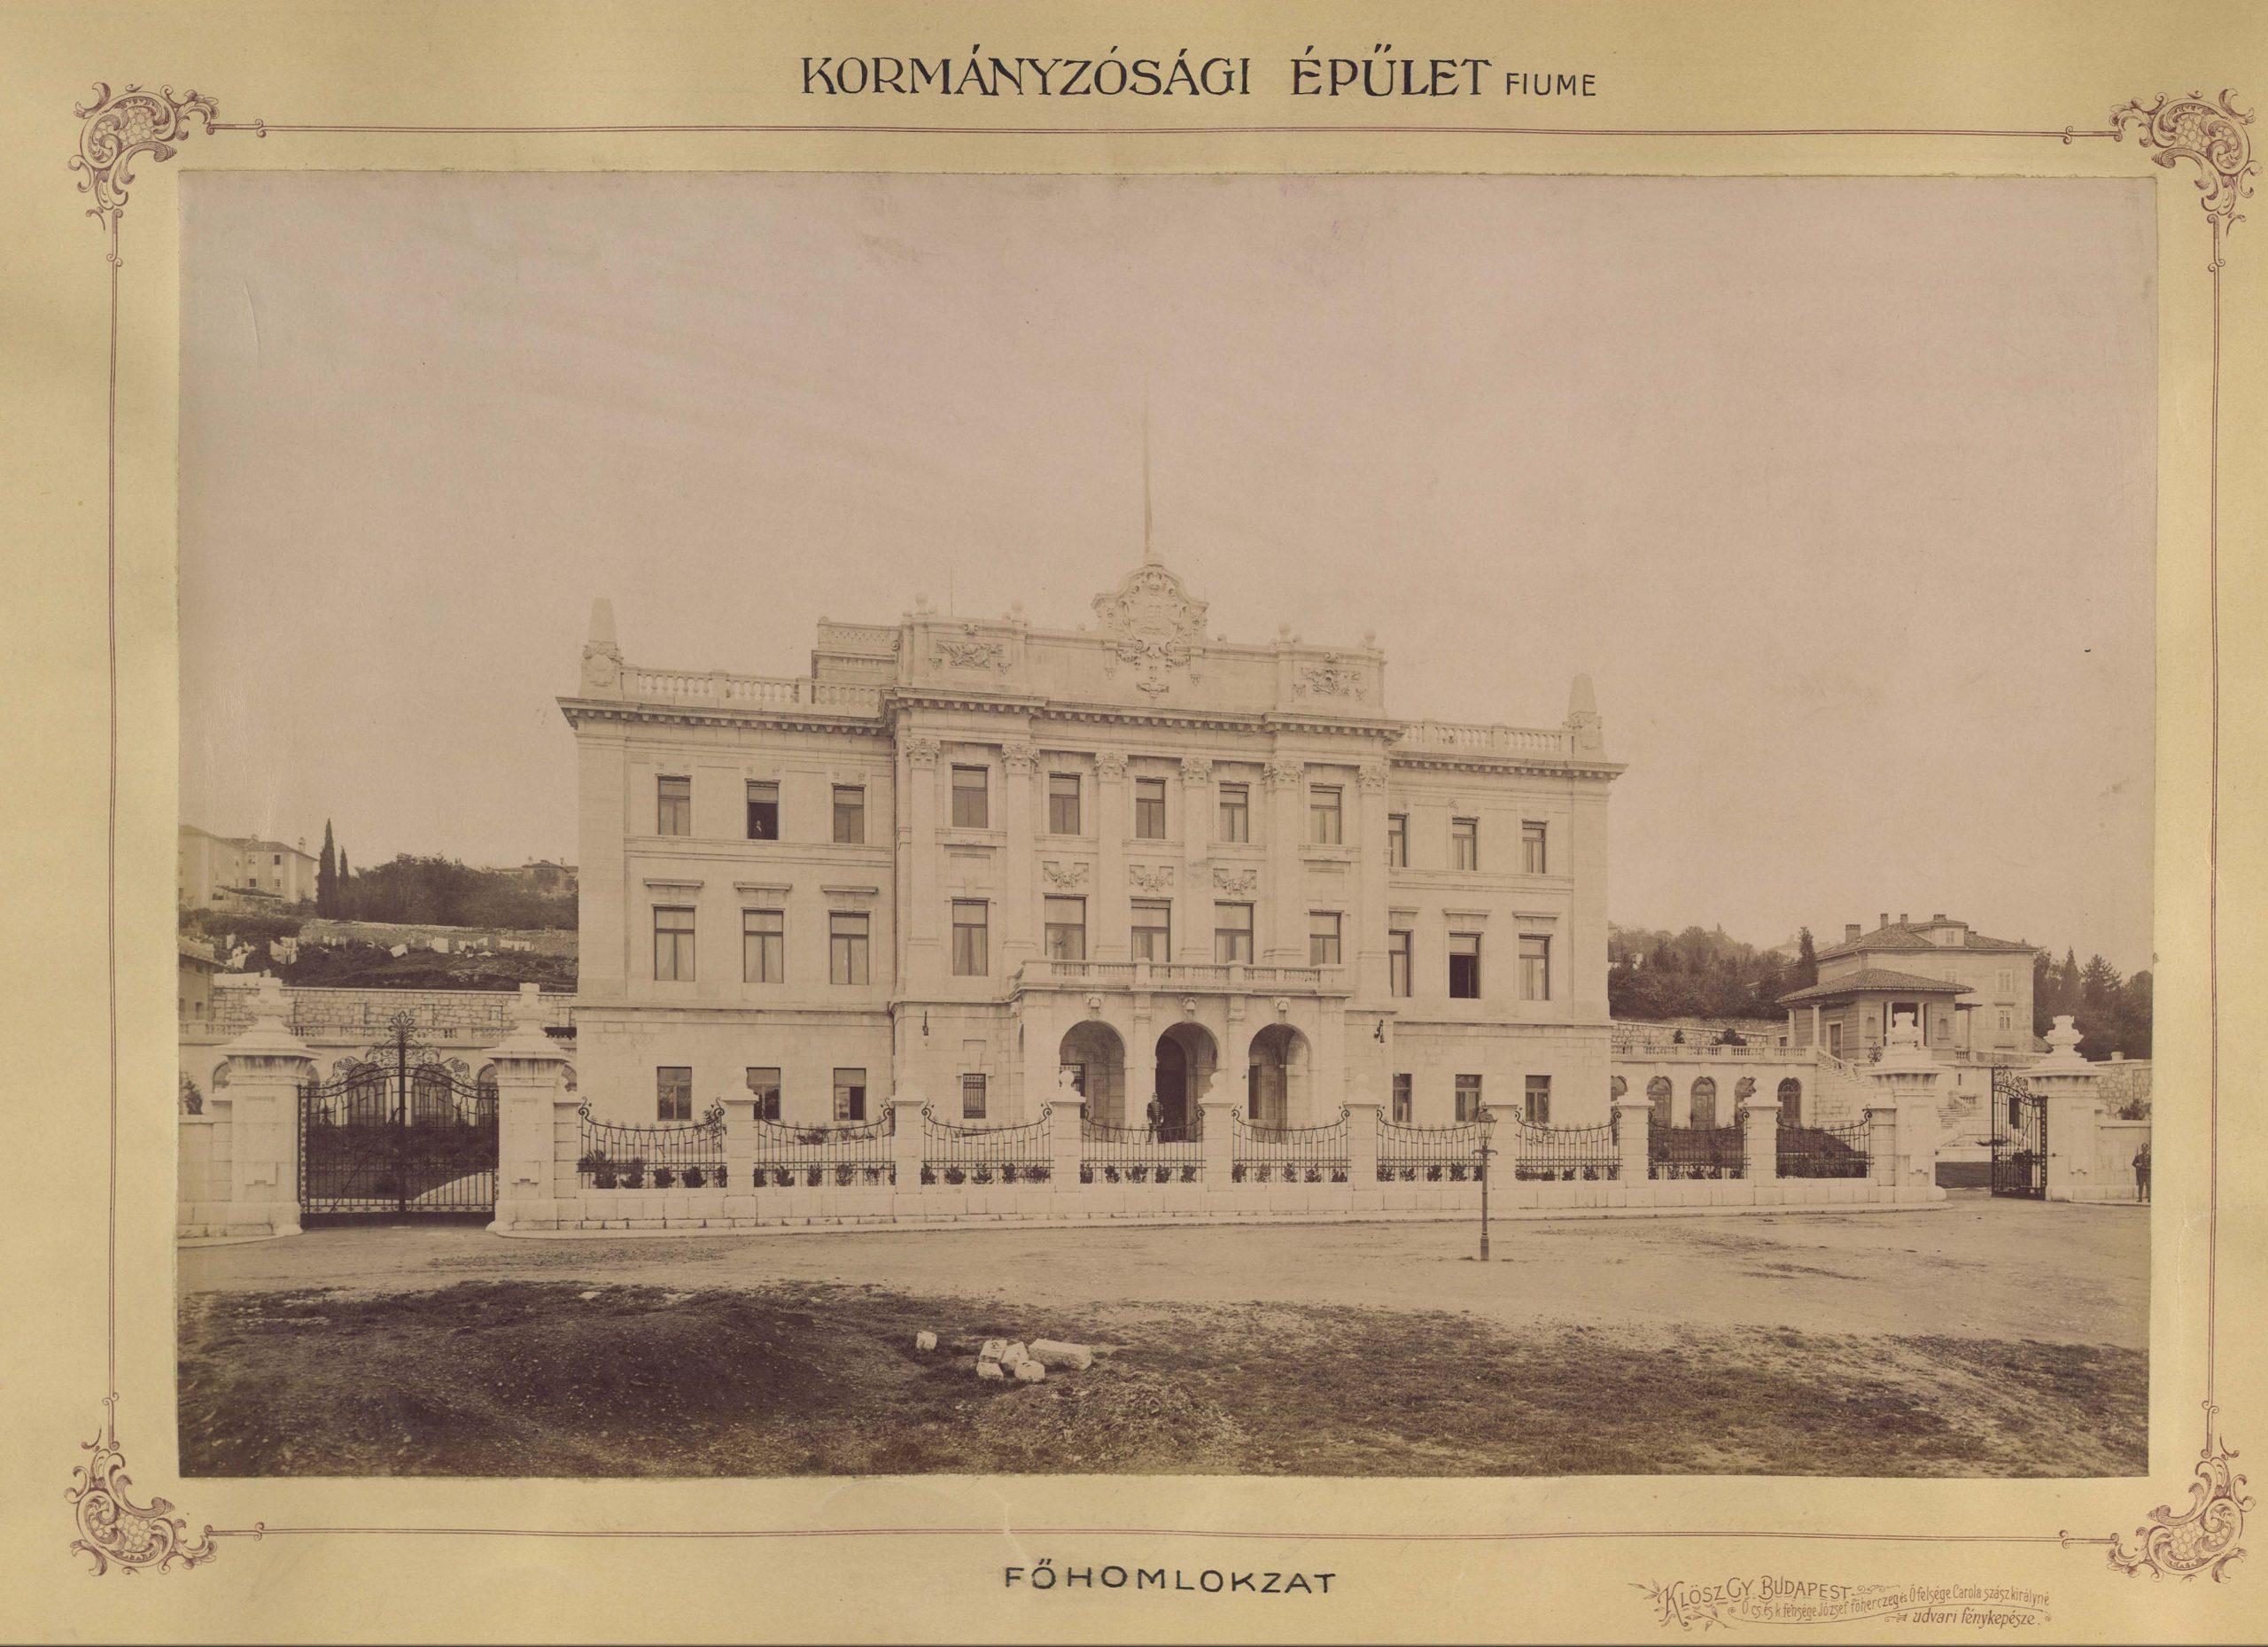 Die von Alajos/Alois Hauszmann entworfene Hauptfassade des Gouverneurspalastes in Fiume/Rijeka um 1897–1899.